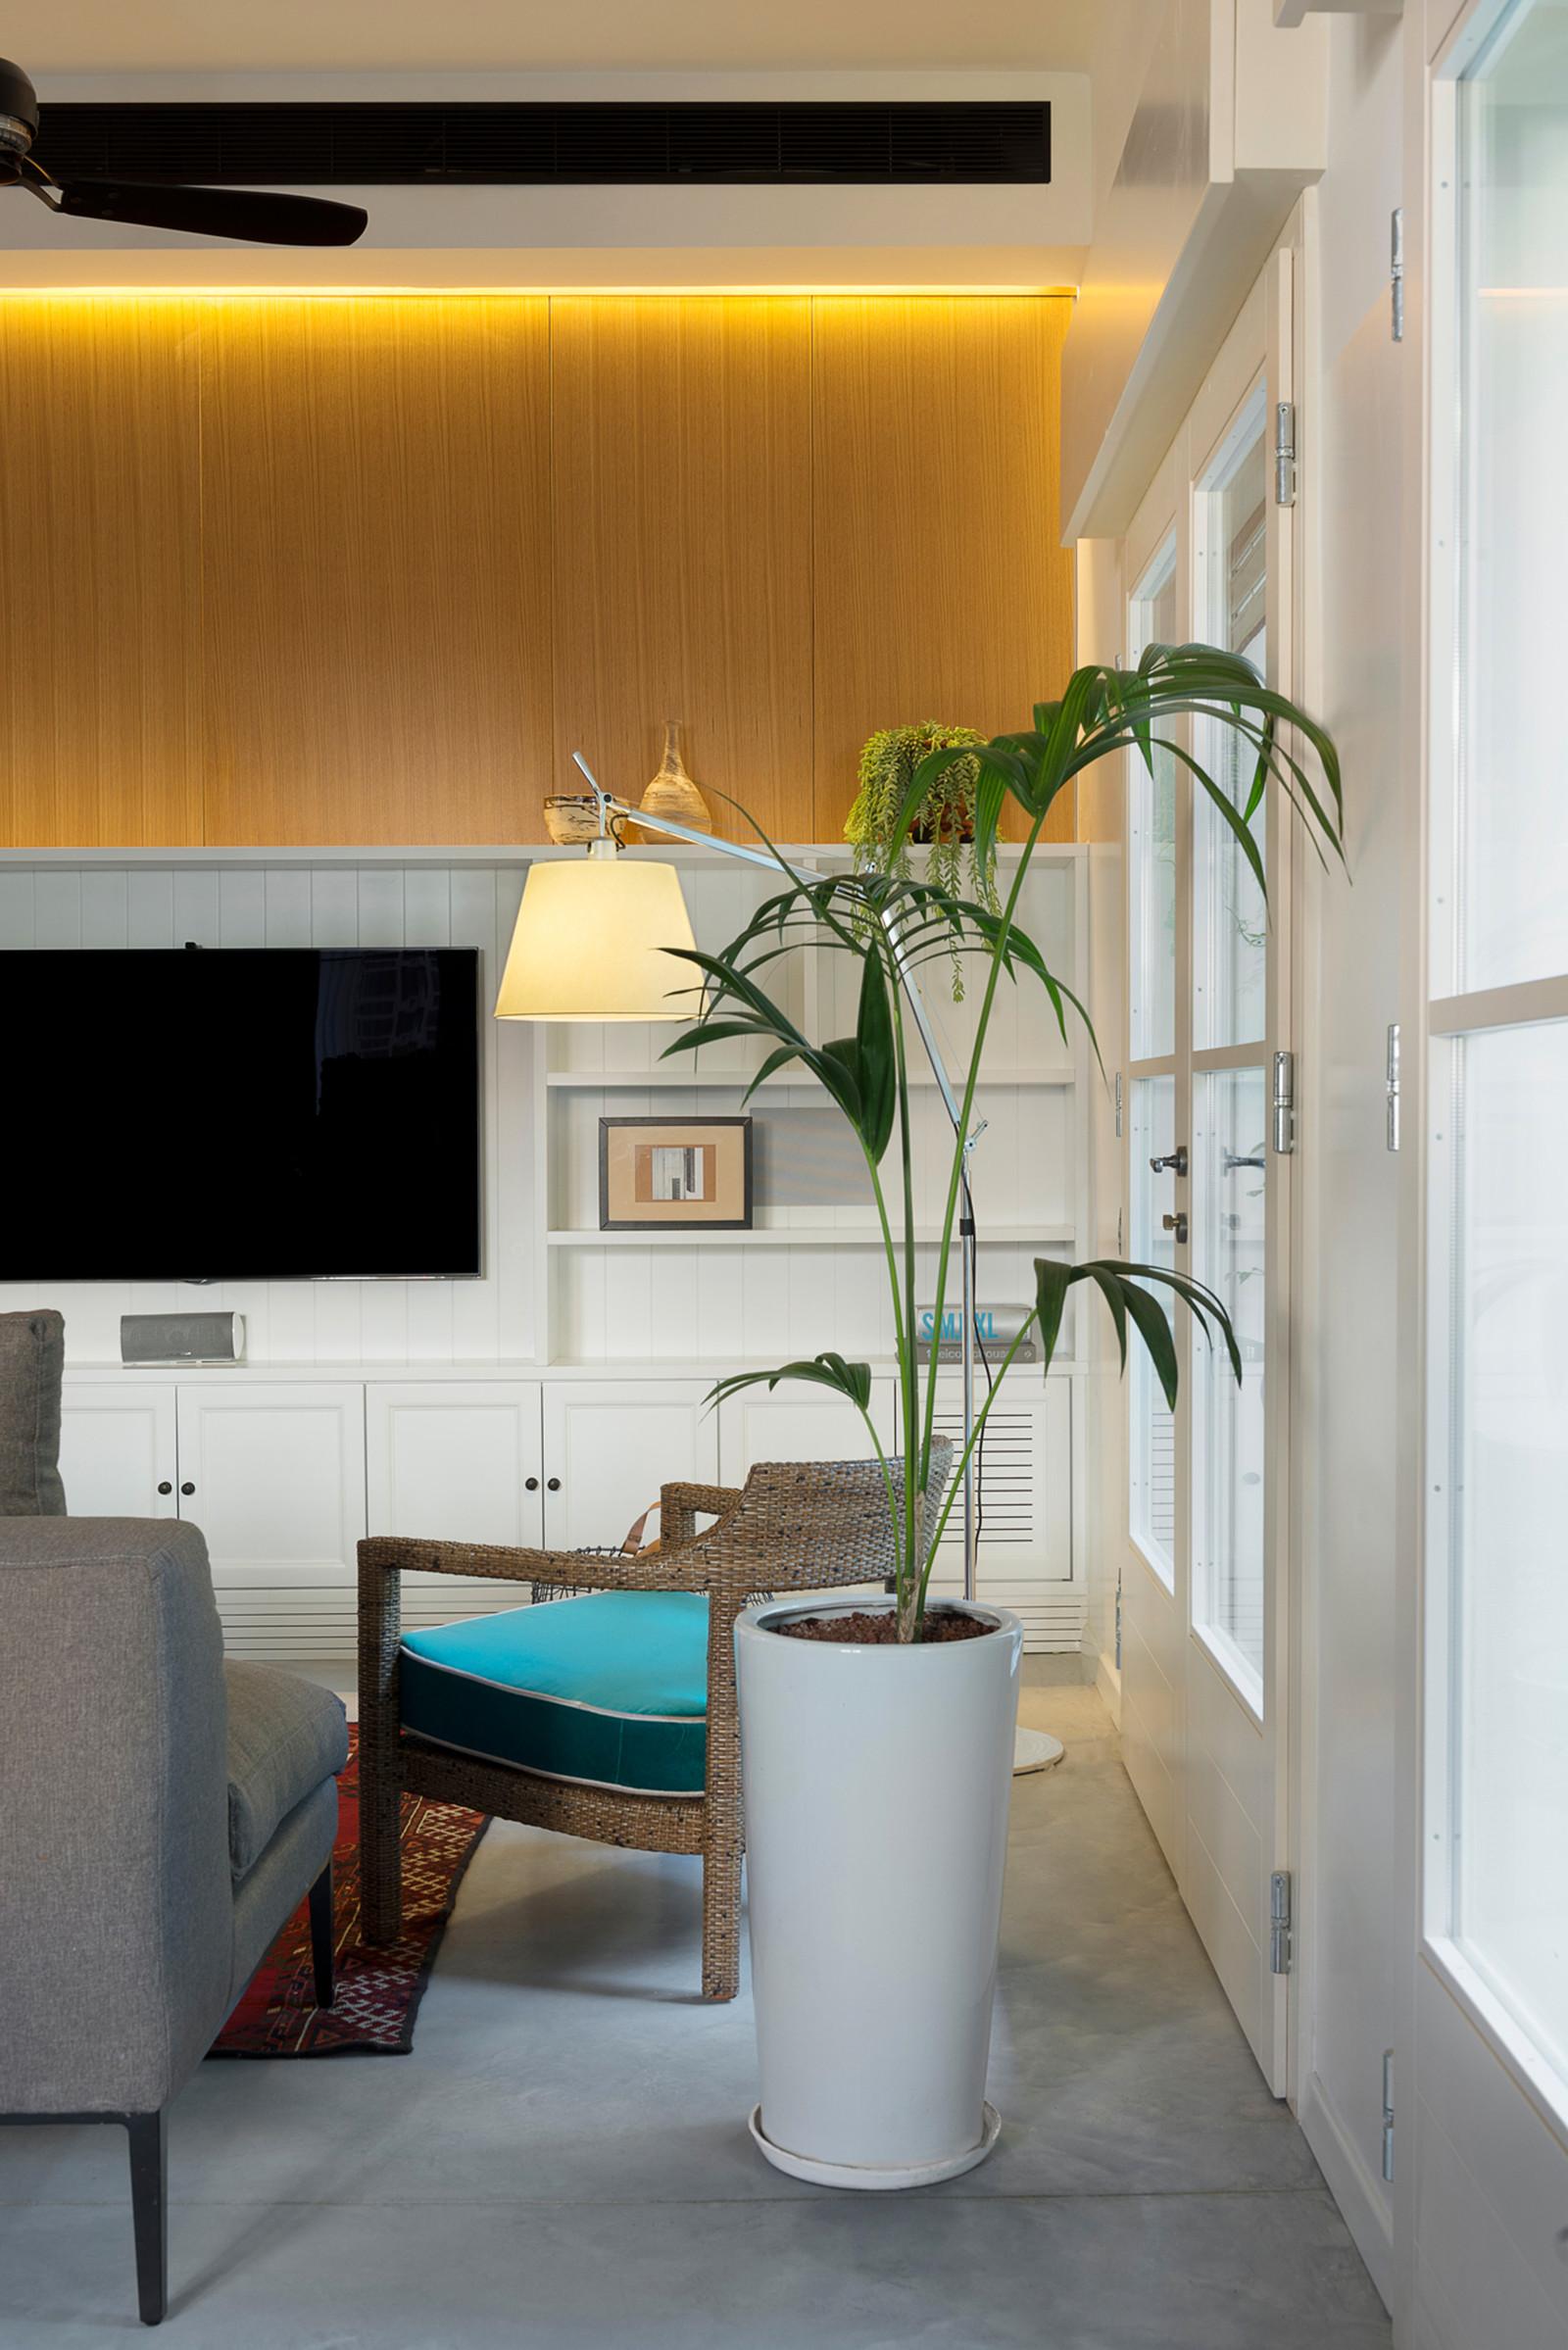 Apartment-renovation-just3ds.com-5